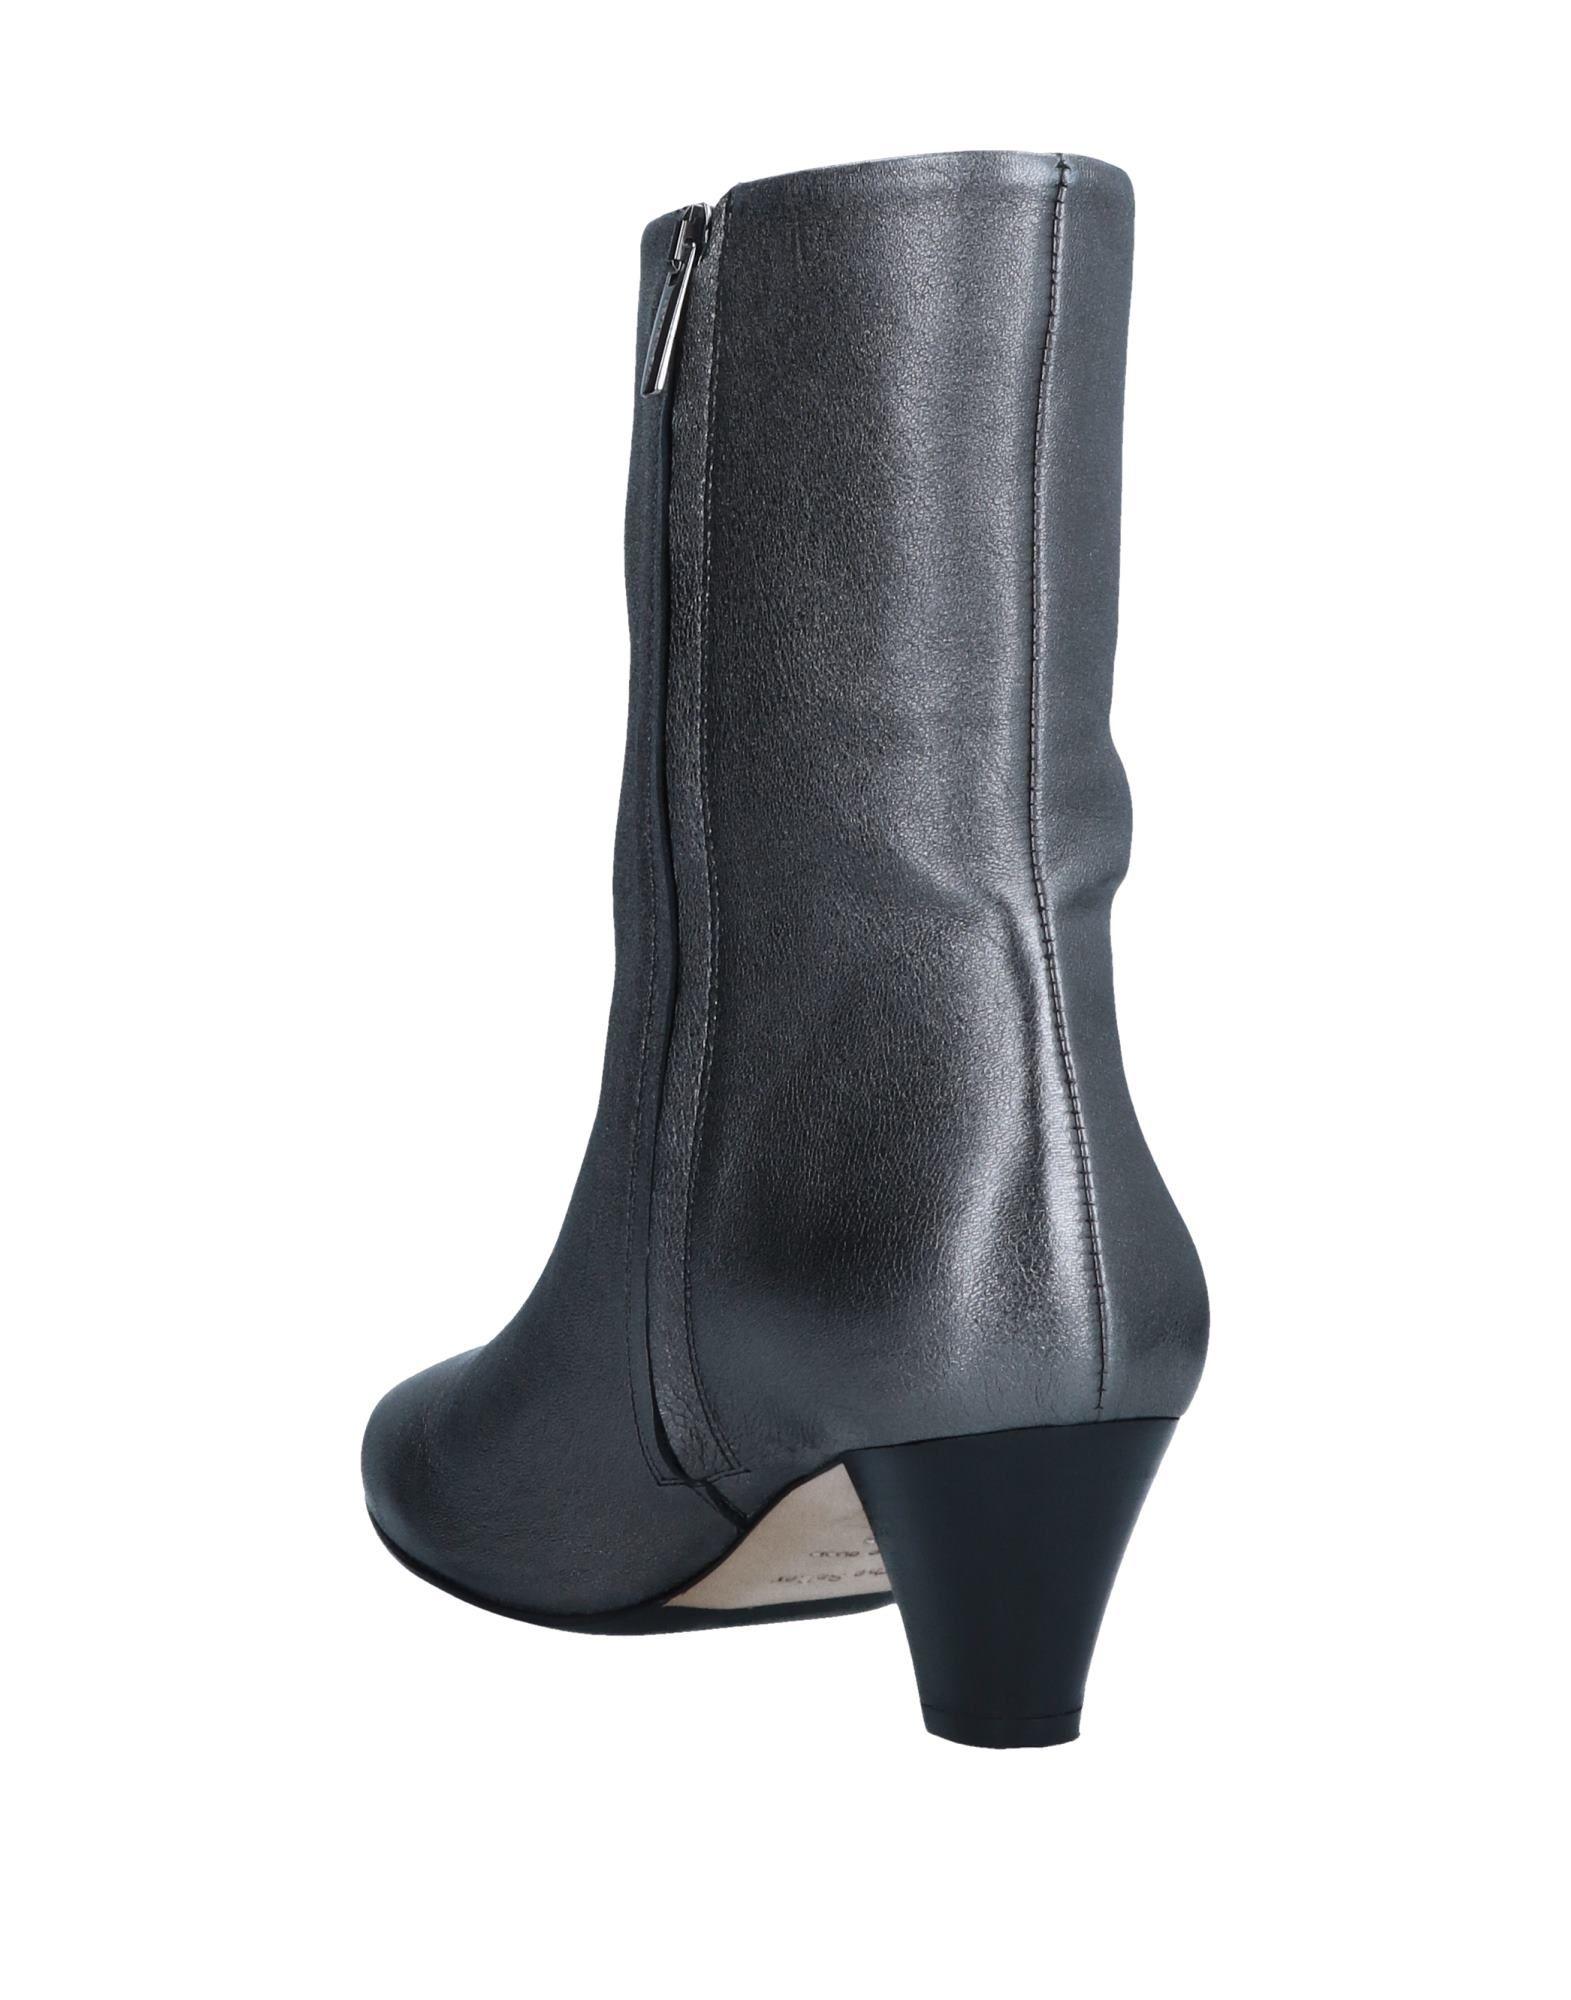 Stilvolle billige Schuhe Damen The Seller Stiefelette Damen Schuhe  11525846GX 29cd62